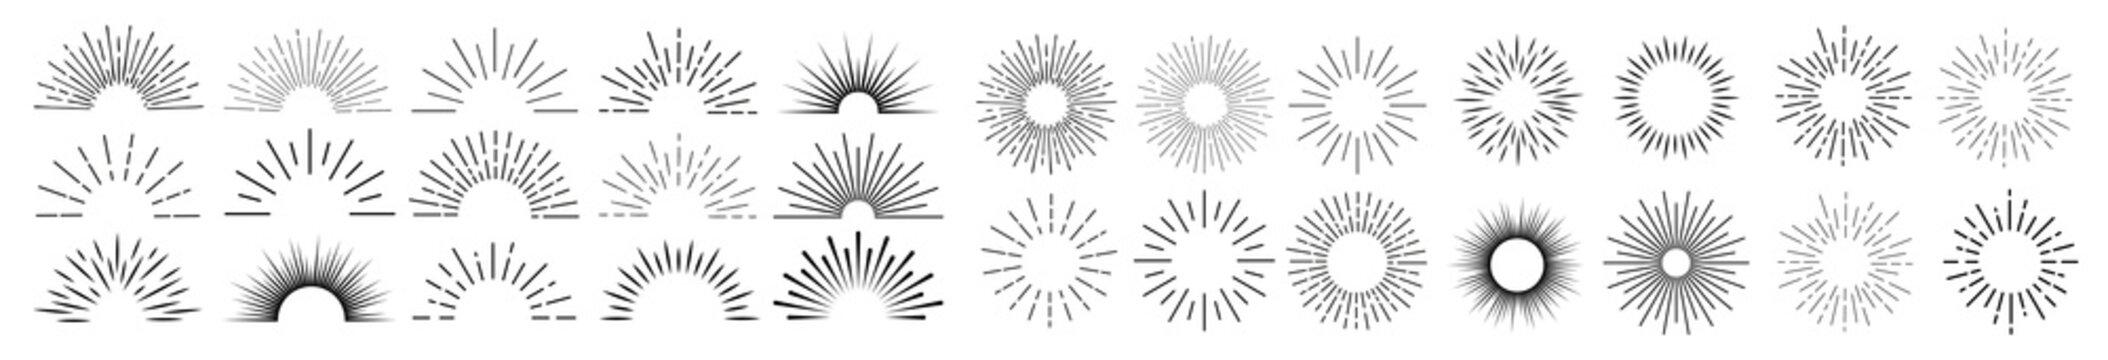 Sun rays hand drawn, linear drawing. Mega set